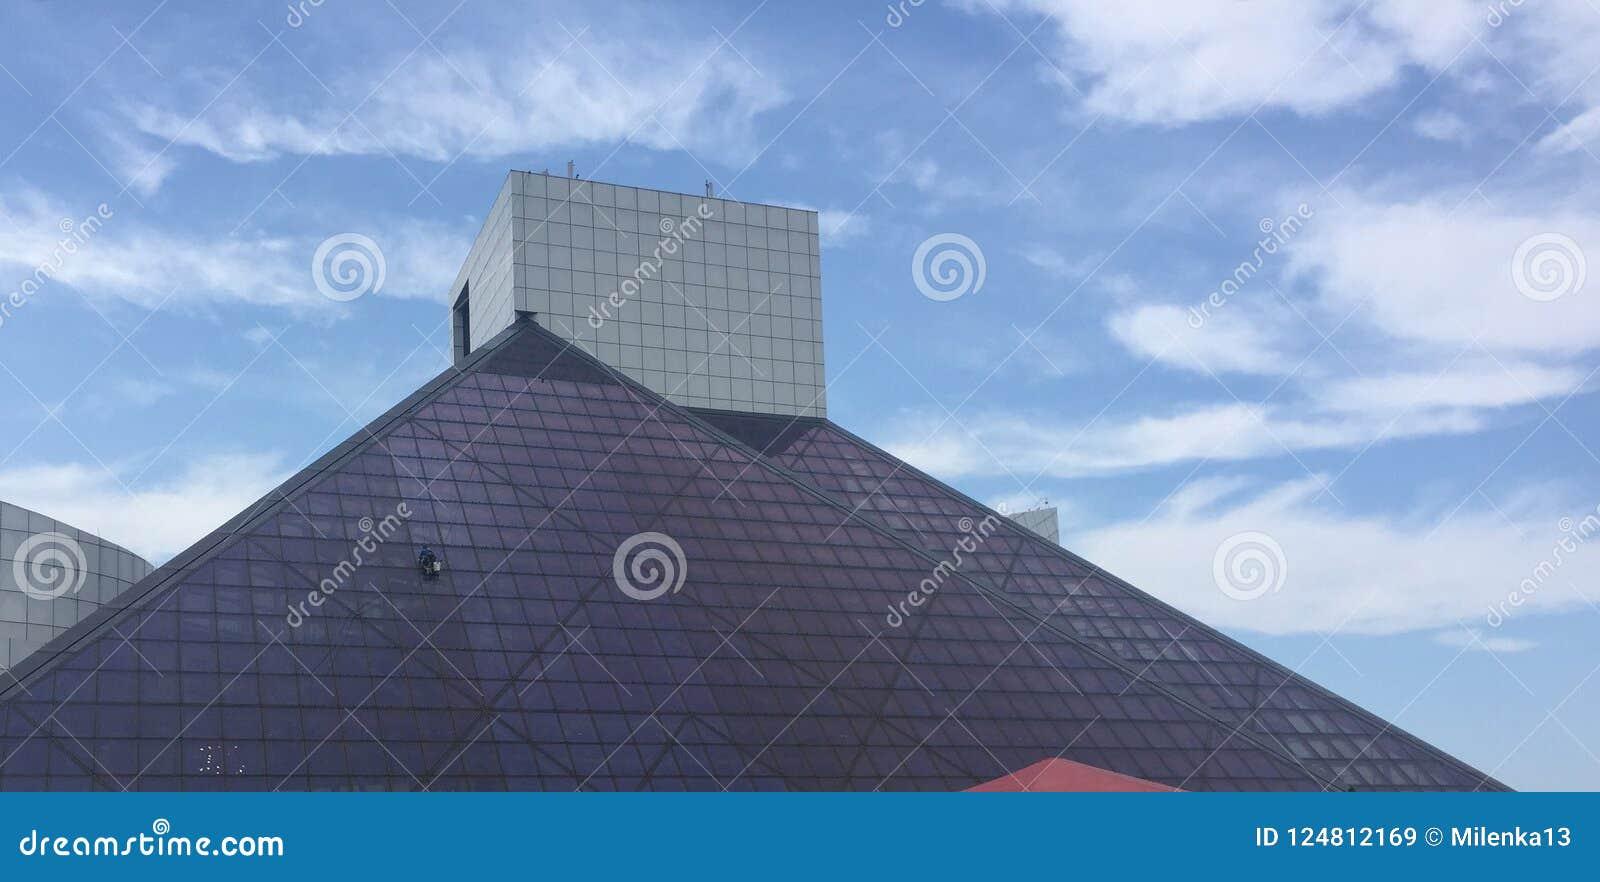 The Pyramid Of Cleveland Ohio Editorial Stock Image - Image